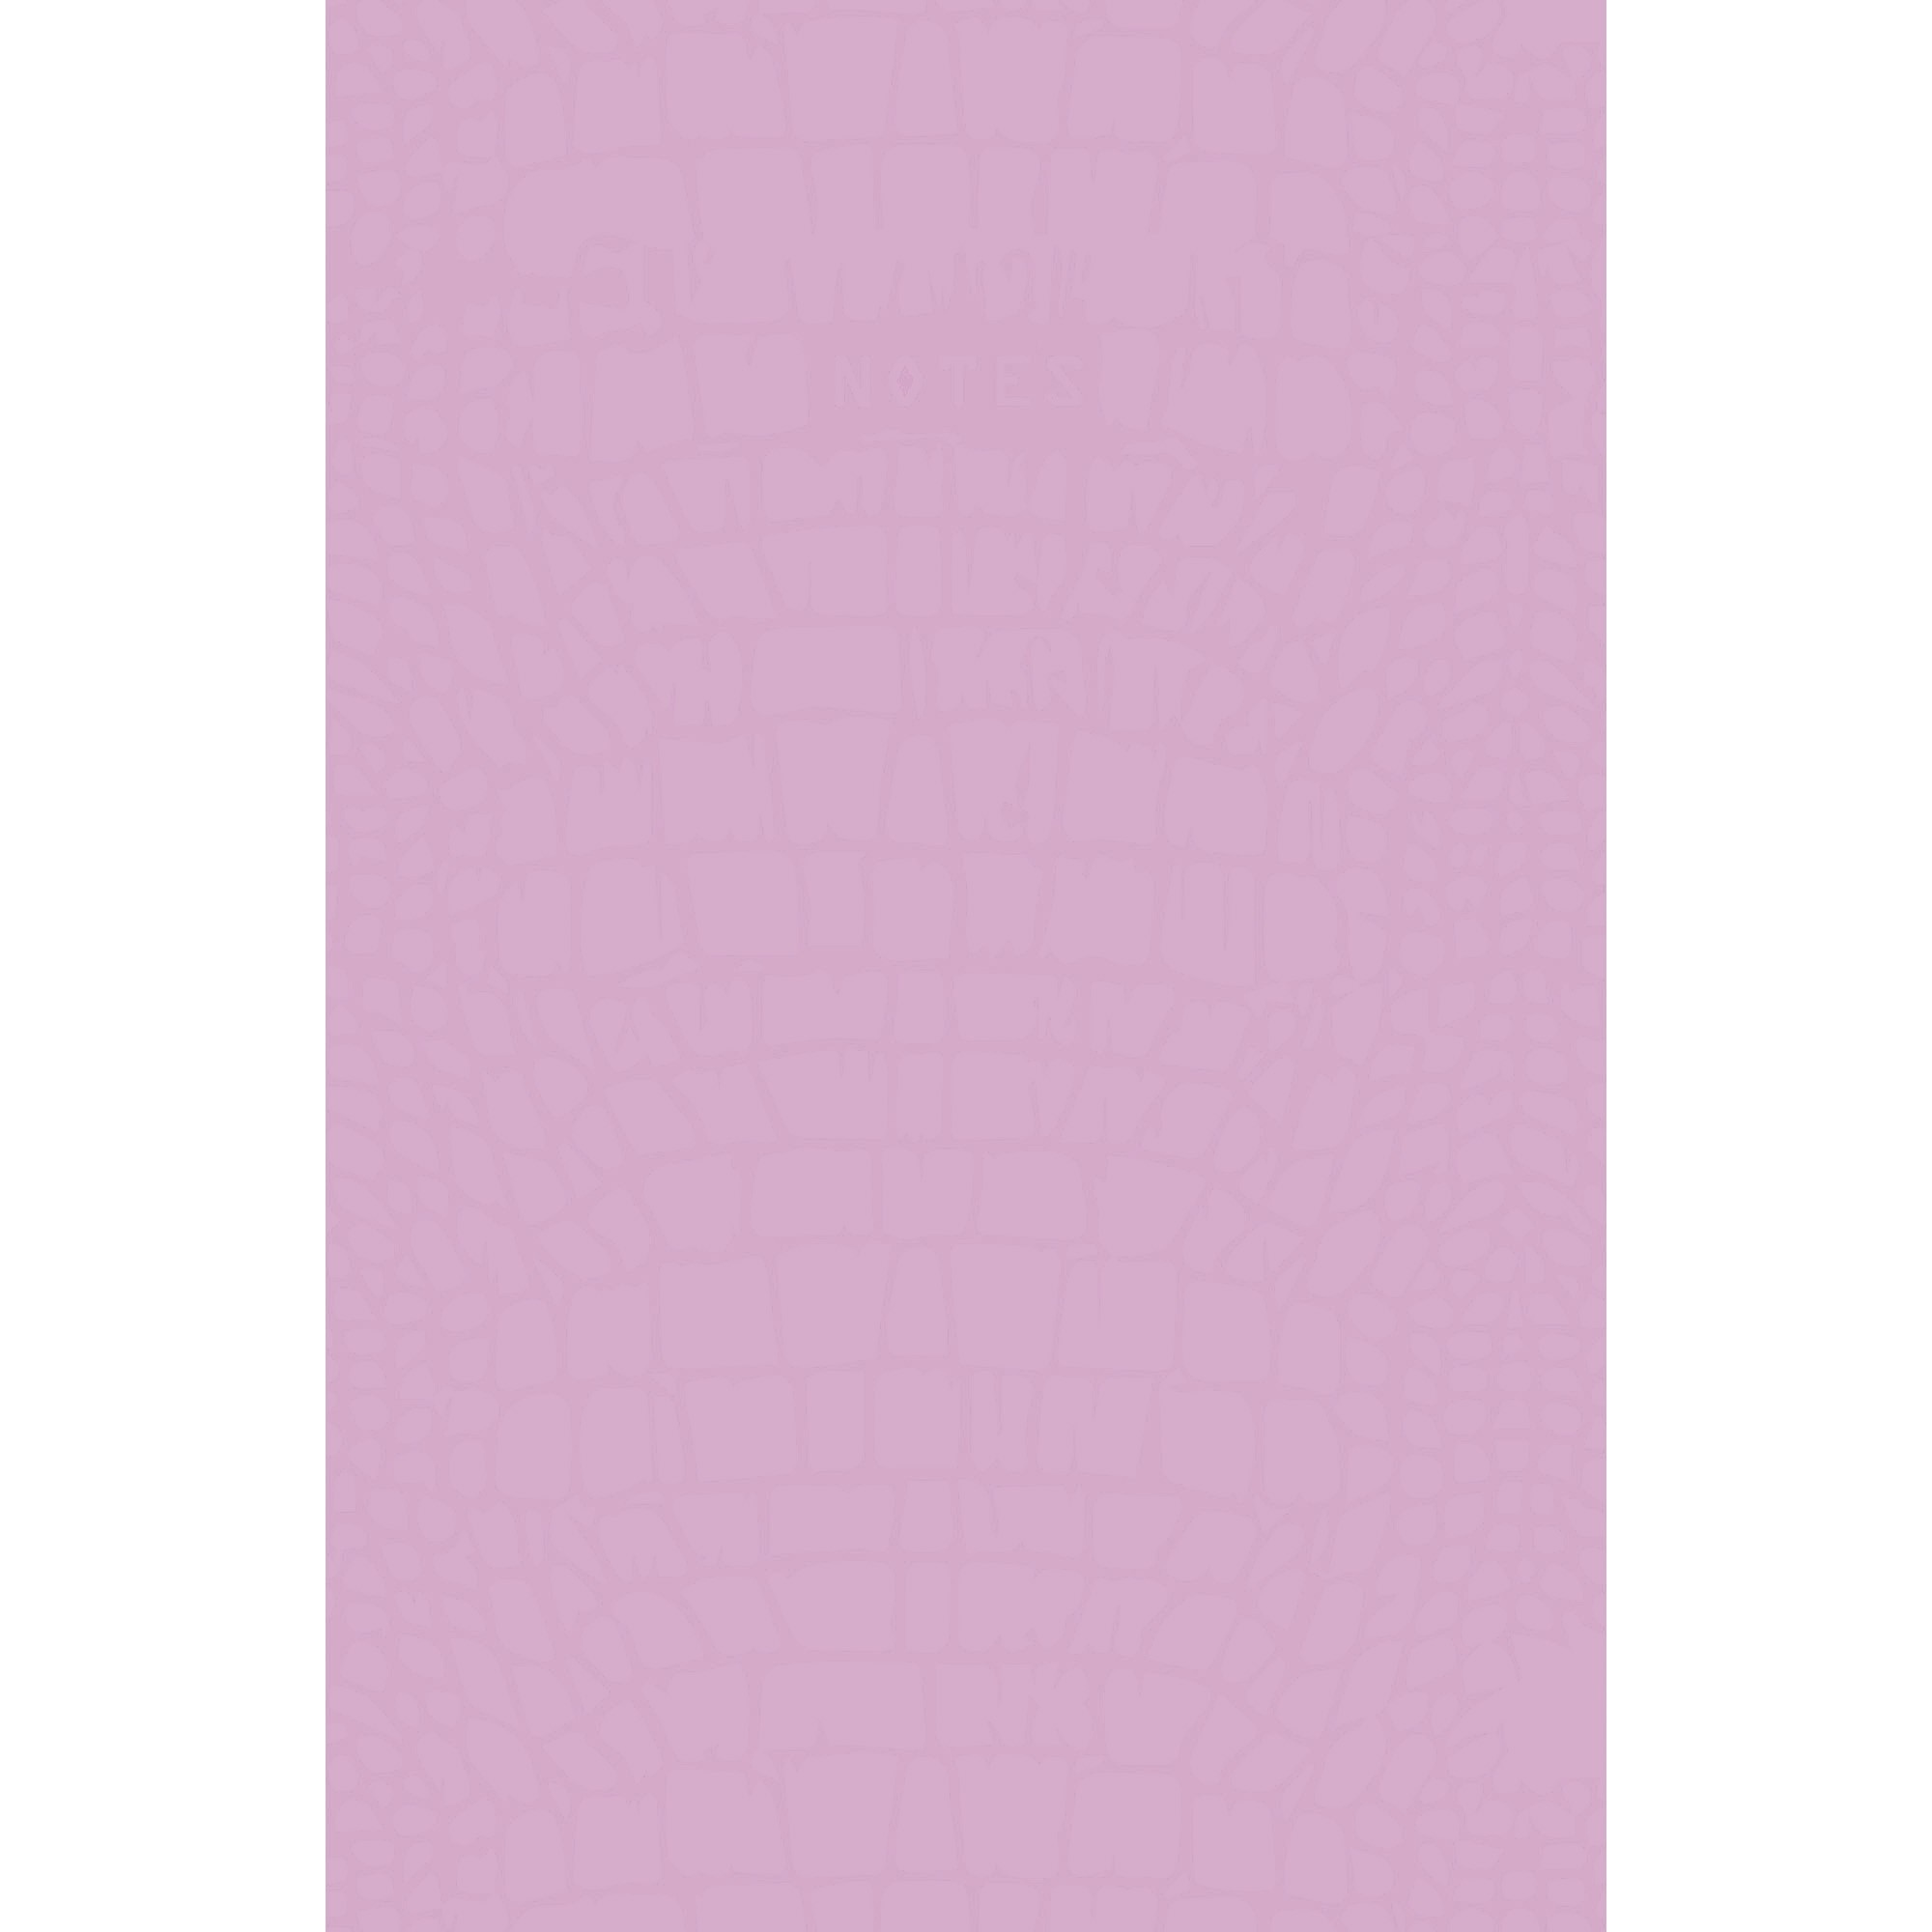 Тетрадь А5 48л точка тв Textures. Розовый